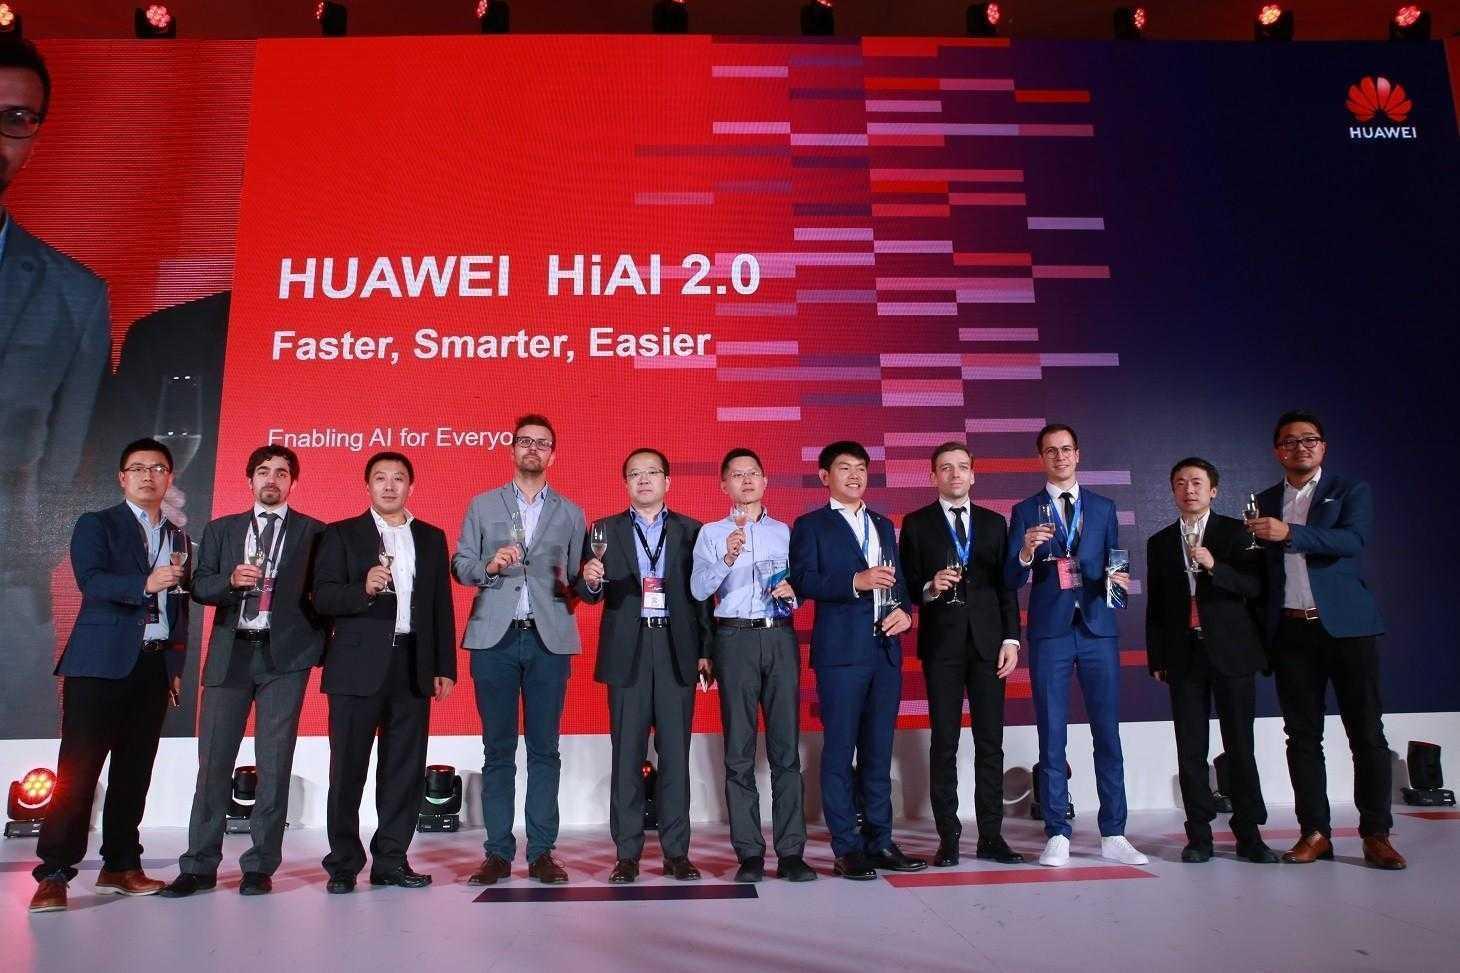 Huawei выпустил новую экосистему HiAI 2.0 (hiai 2.0 launch)